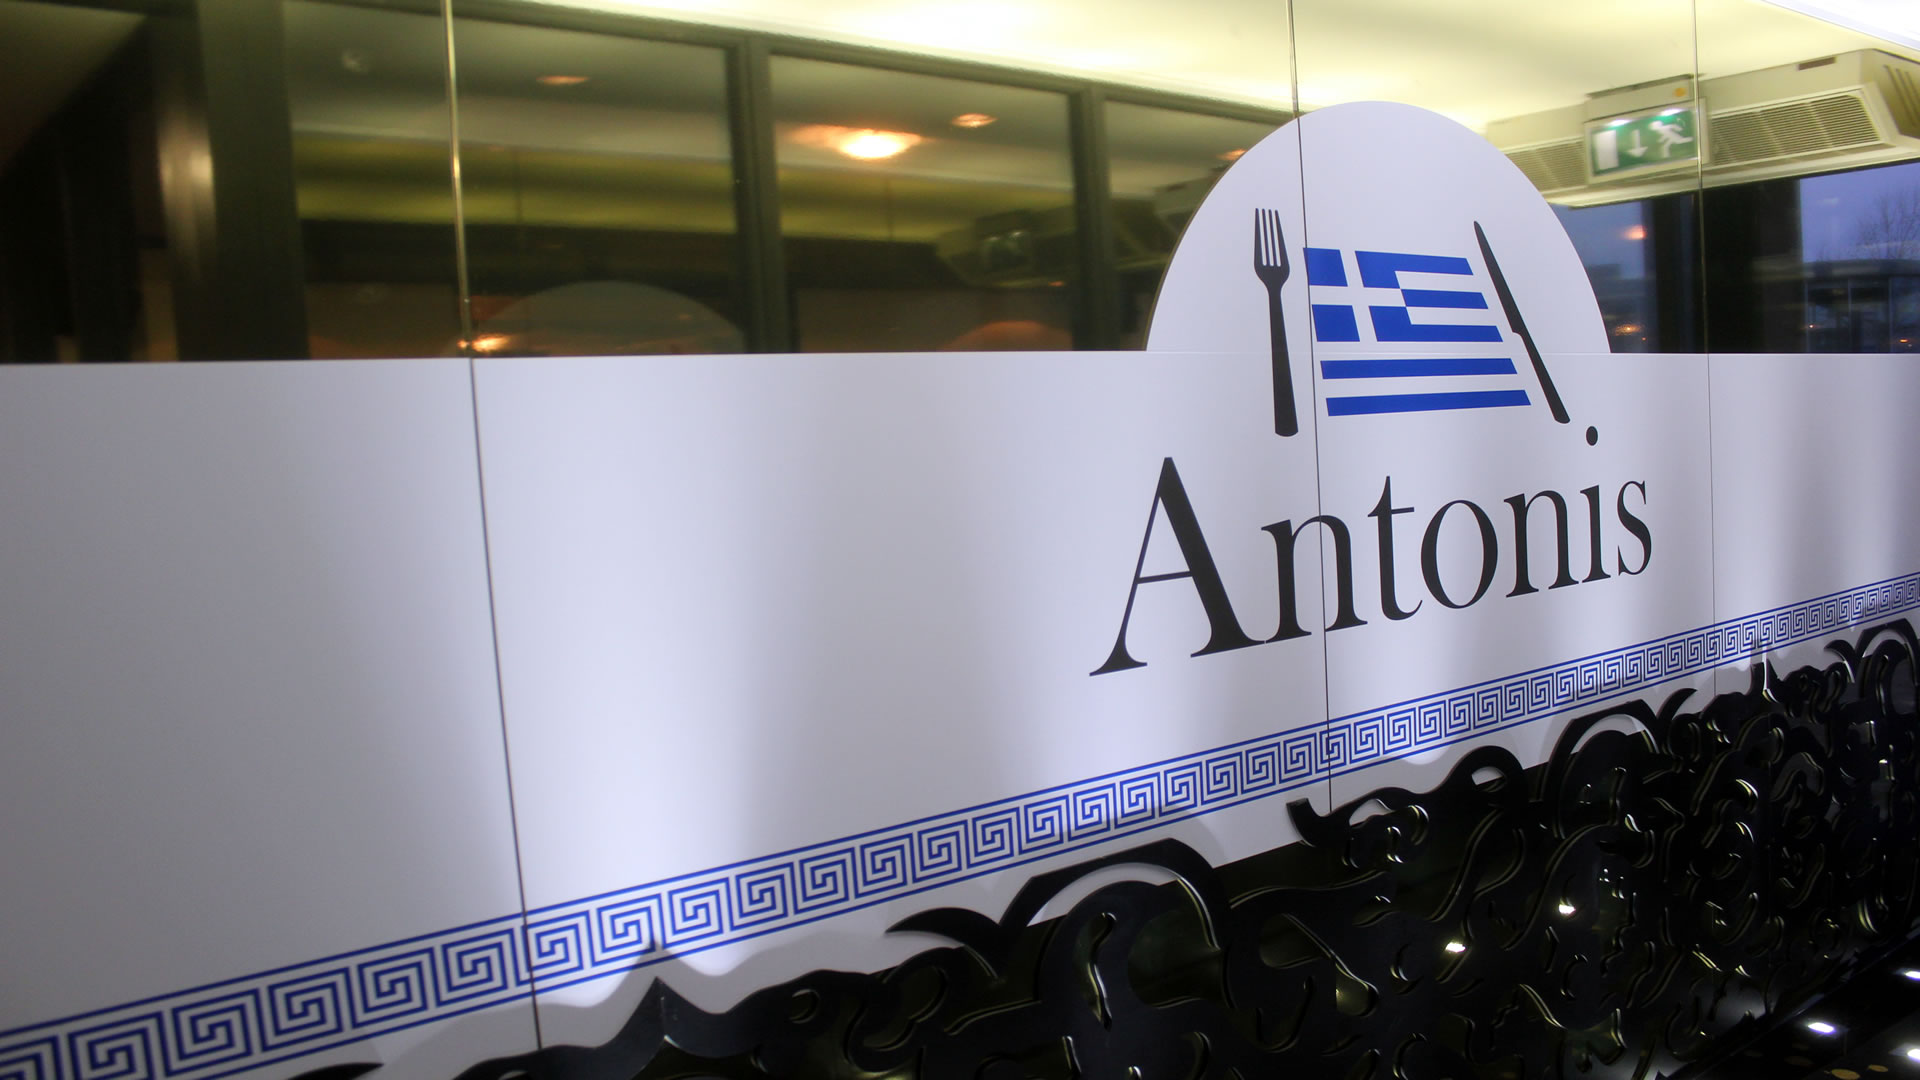 Grieks Restaurant Antonis Kesselskade Maastricht